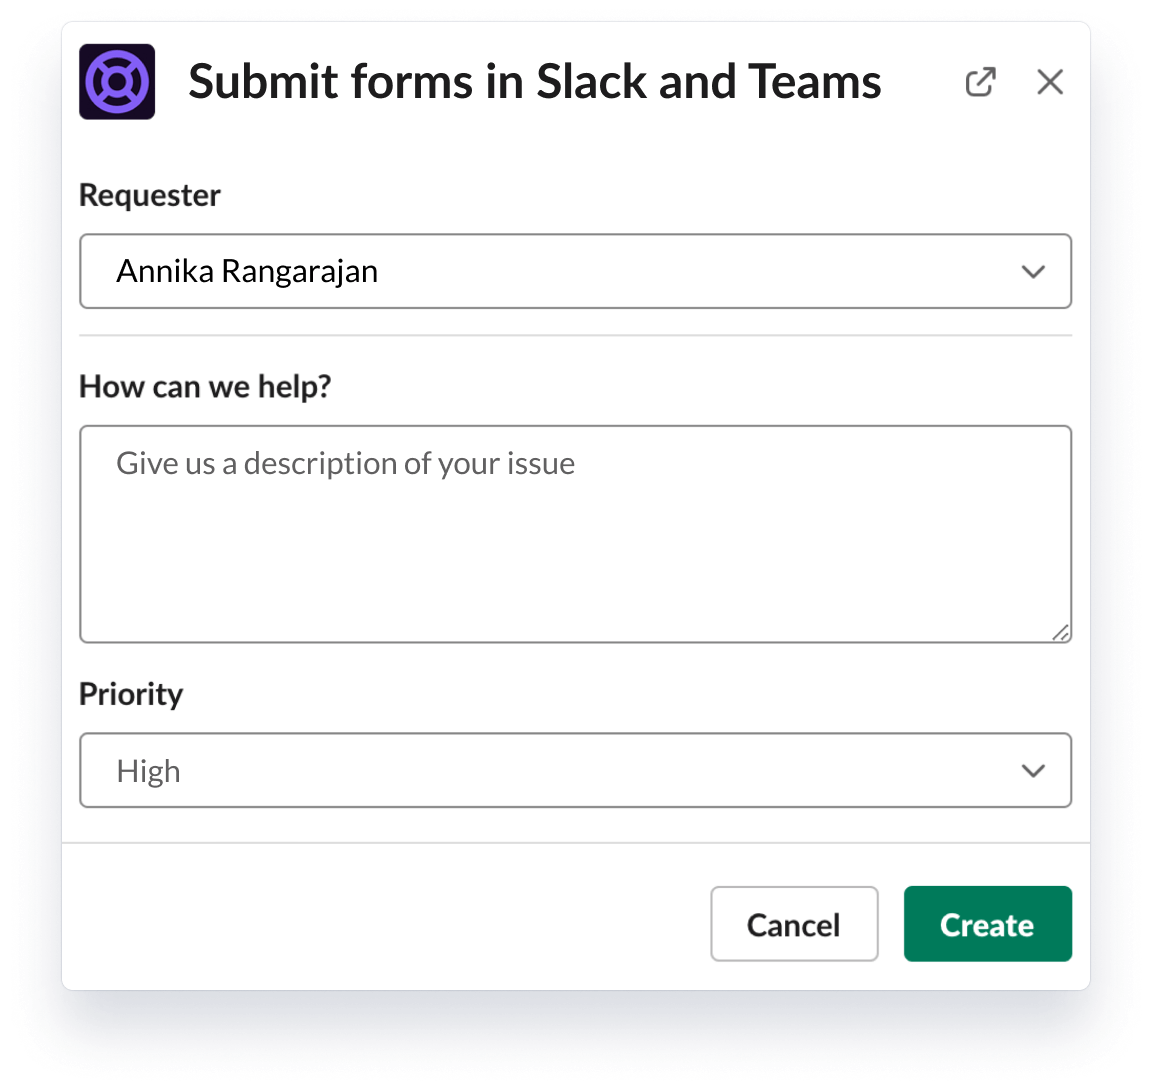 Envío de informes en Slack